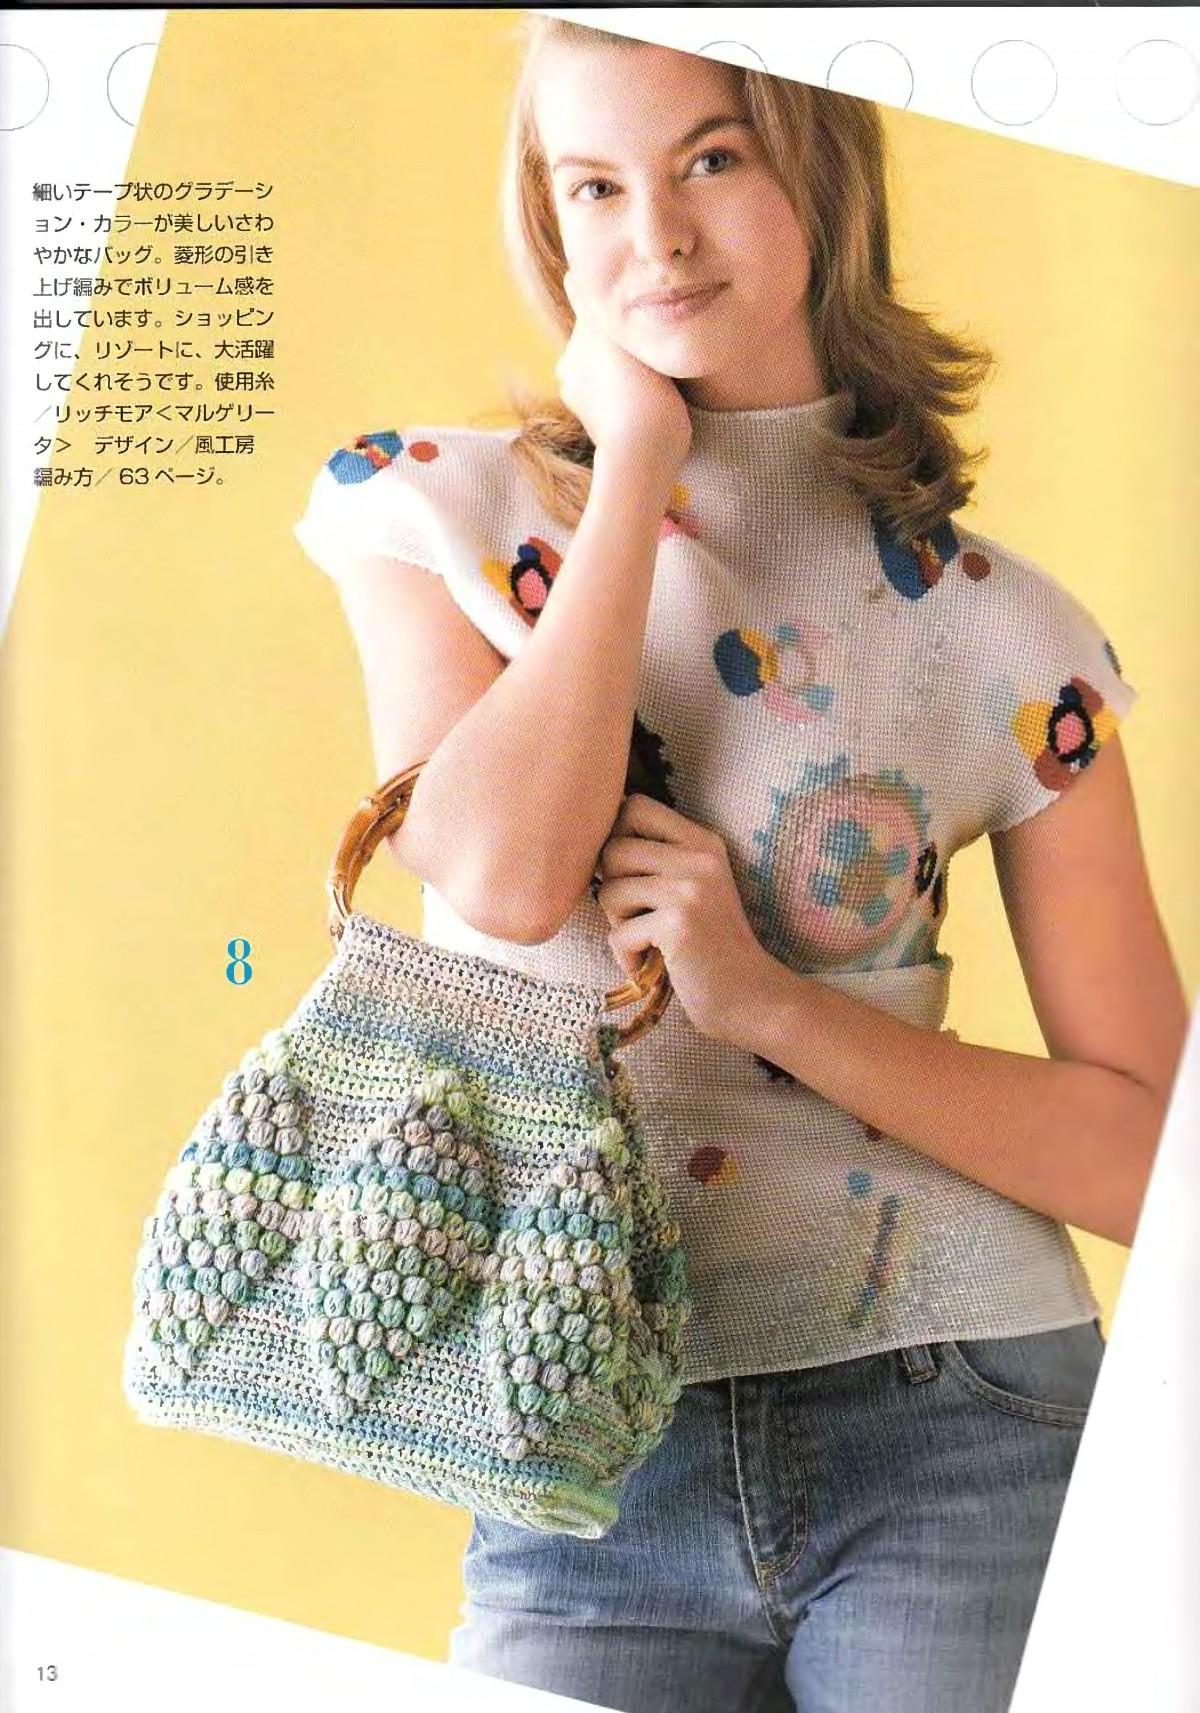 Lets-knit-series-NV4359-2008-Spring-Summer-sp-kr_11.jpg